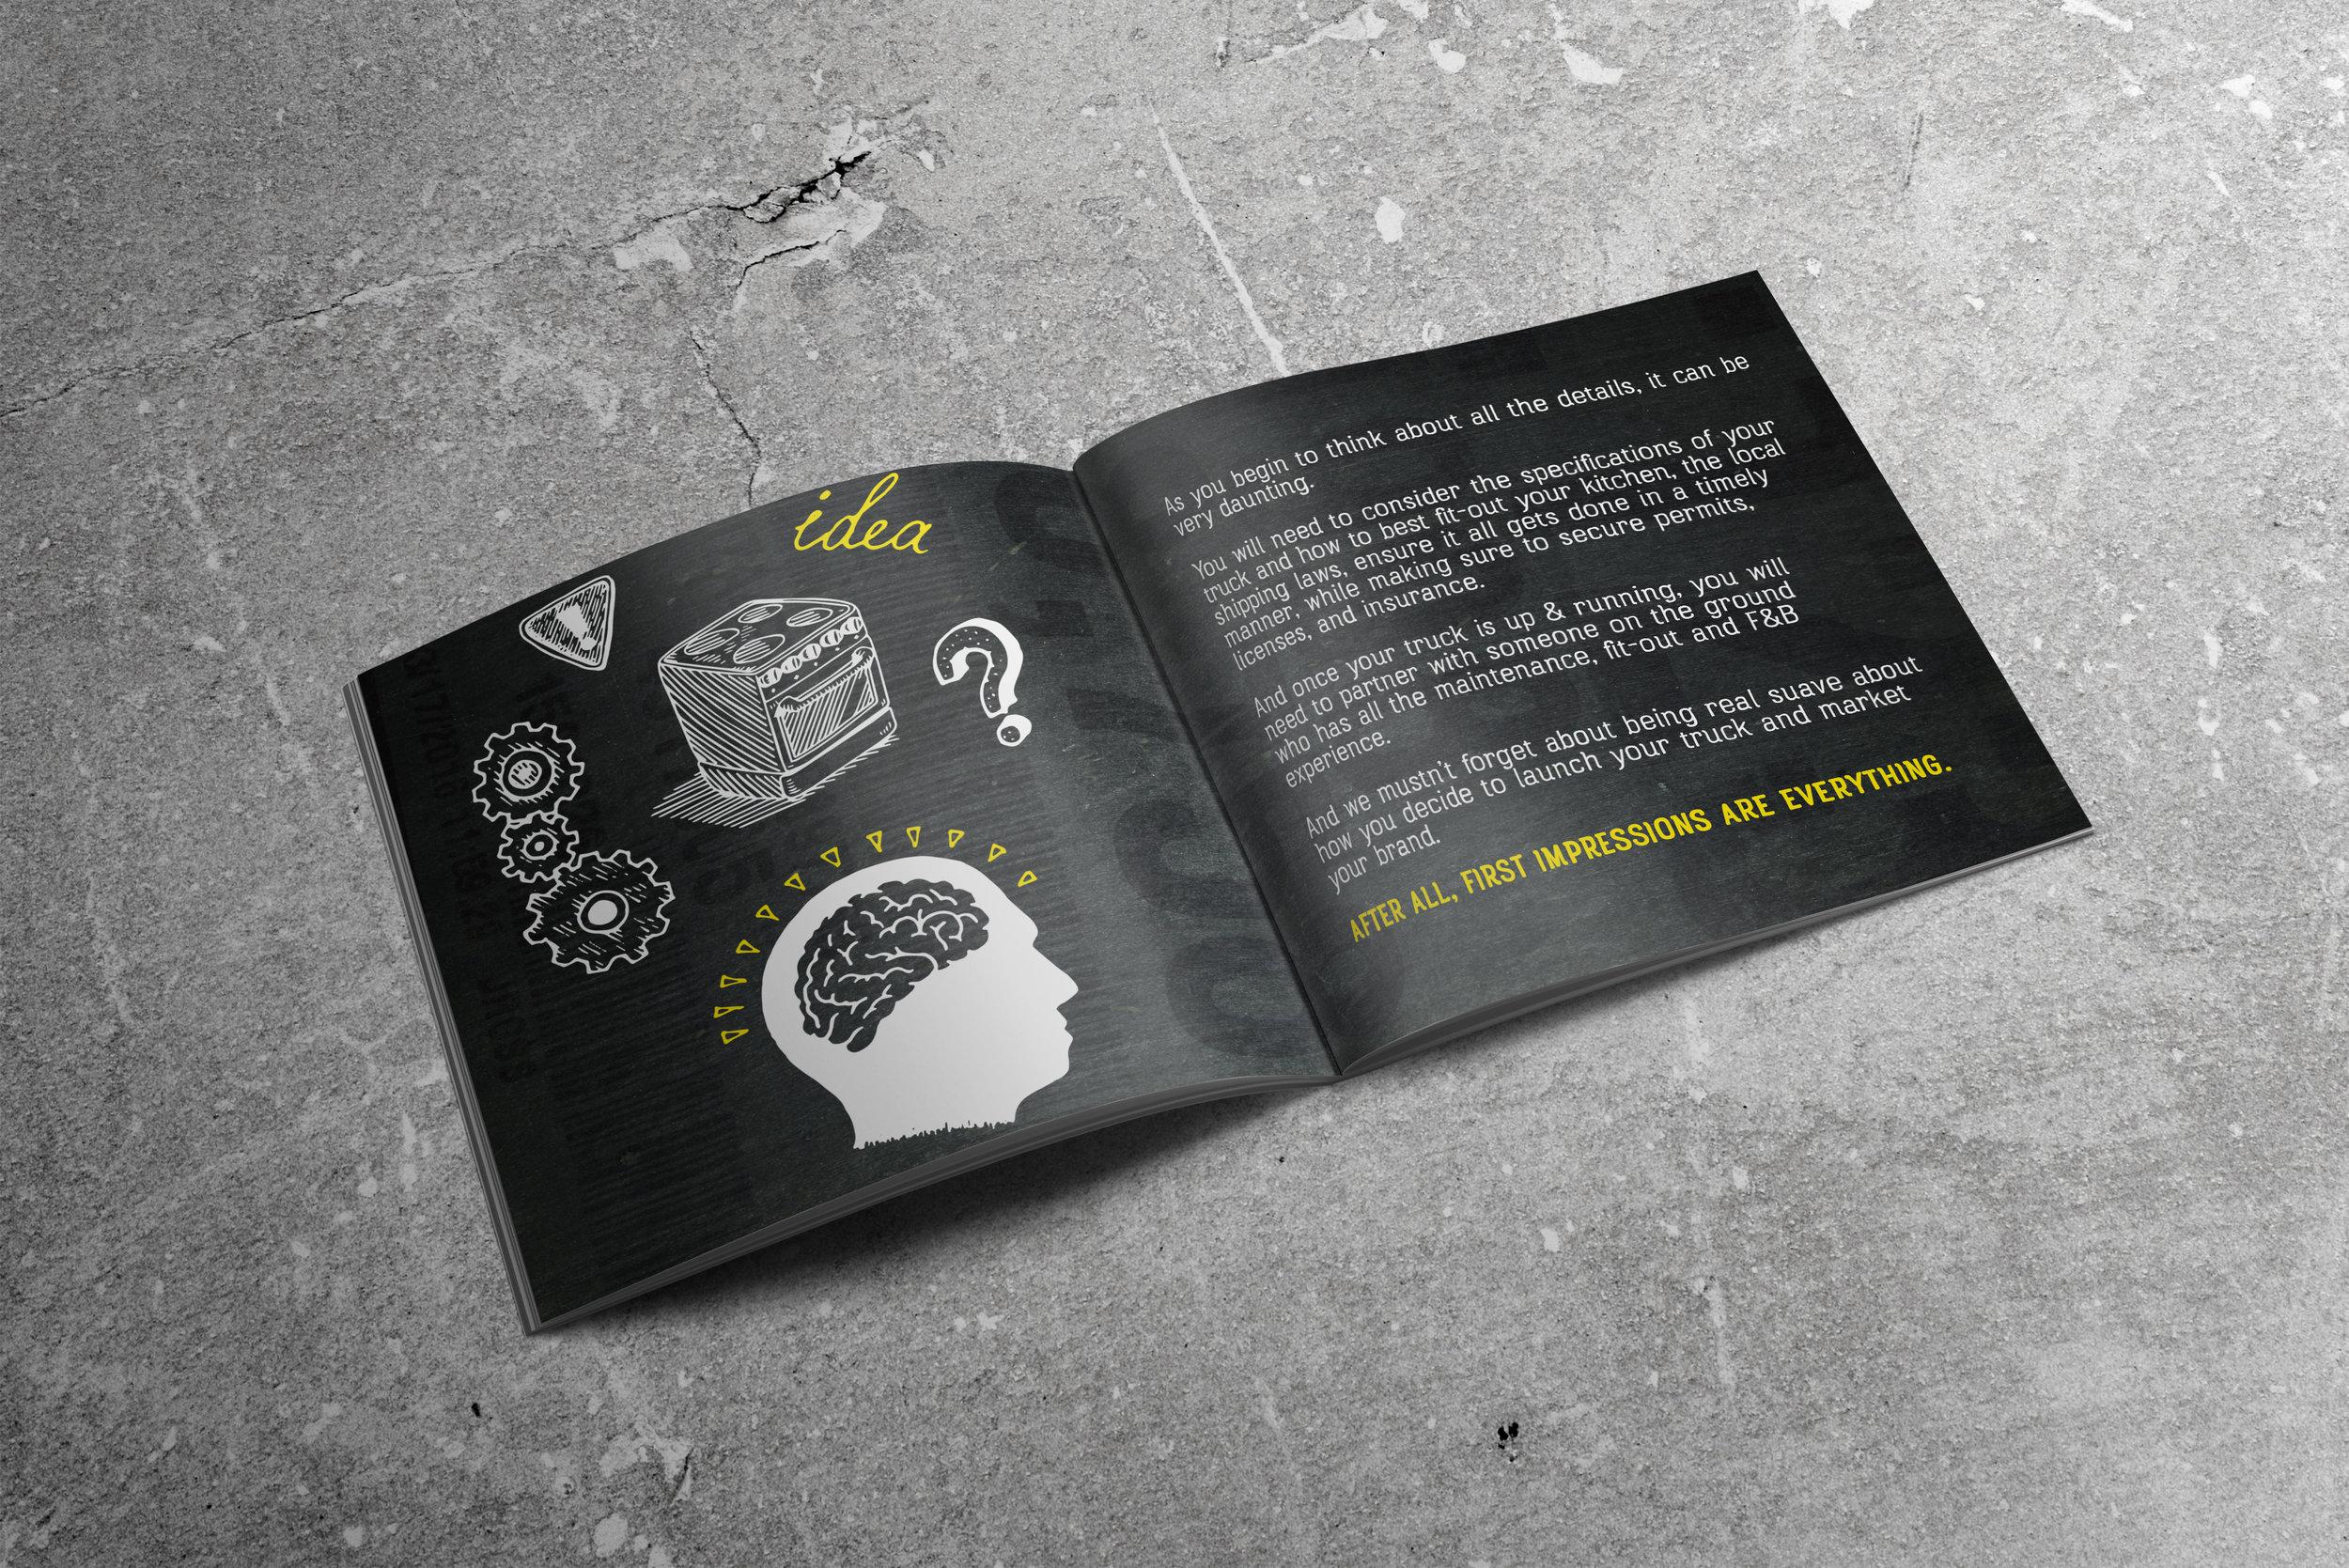 no 2 Brochure-square-free-mockup-by-mockupcloud 1.jpg